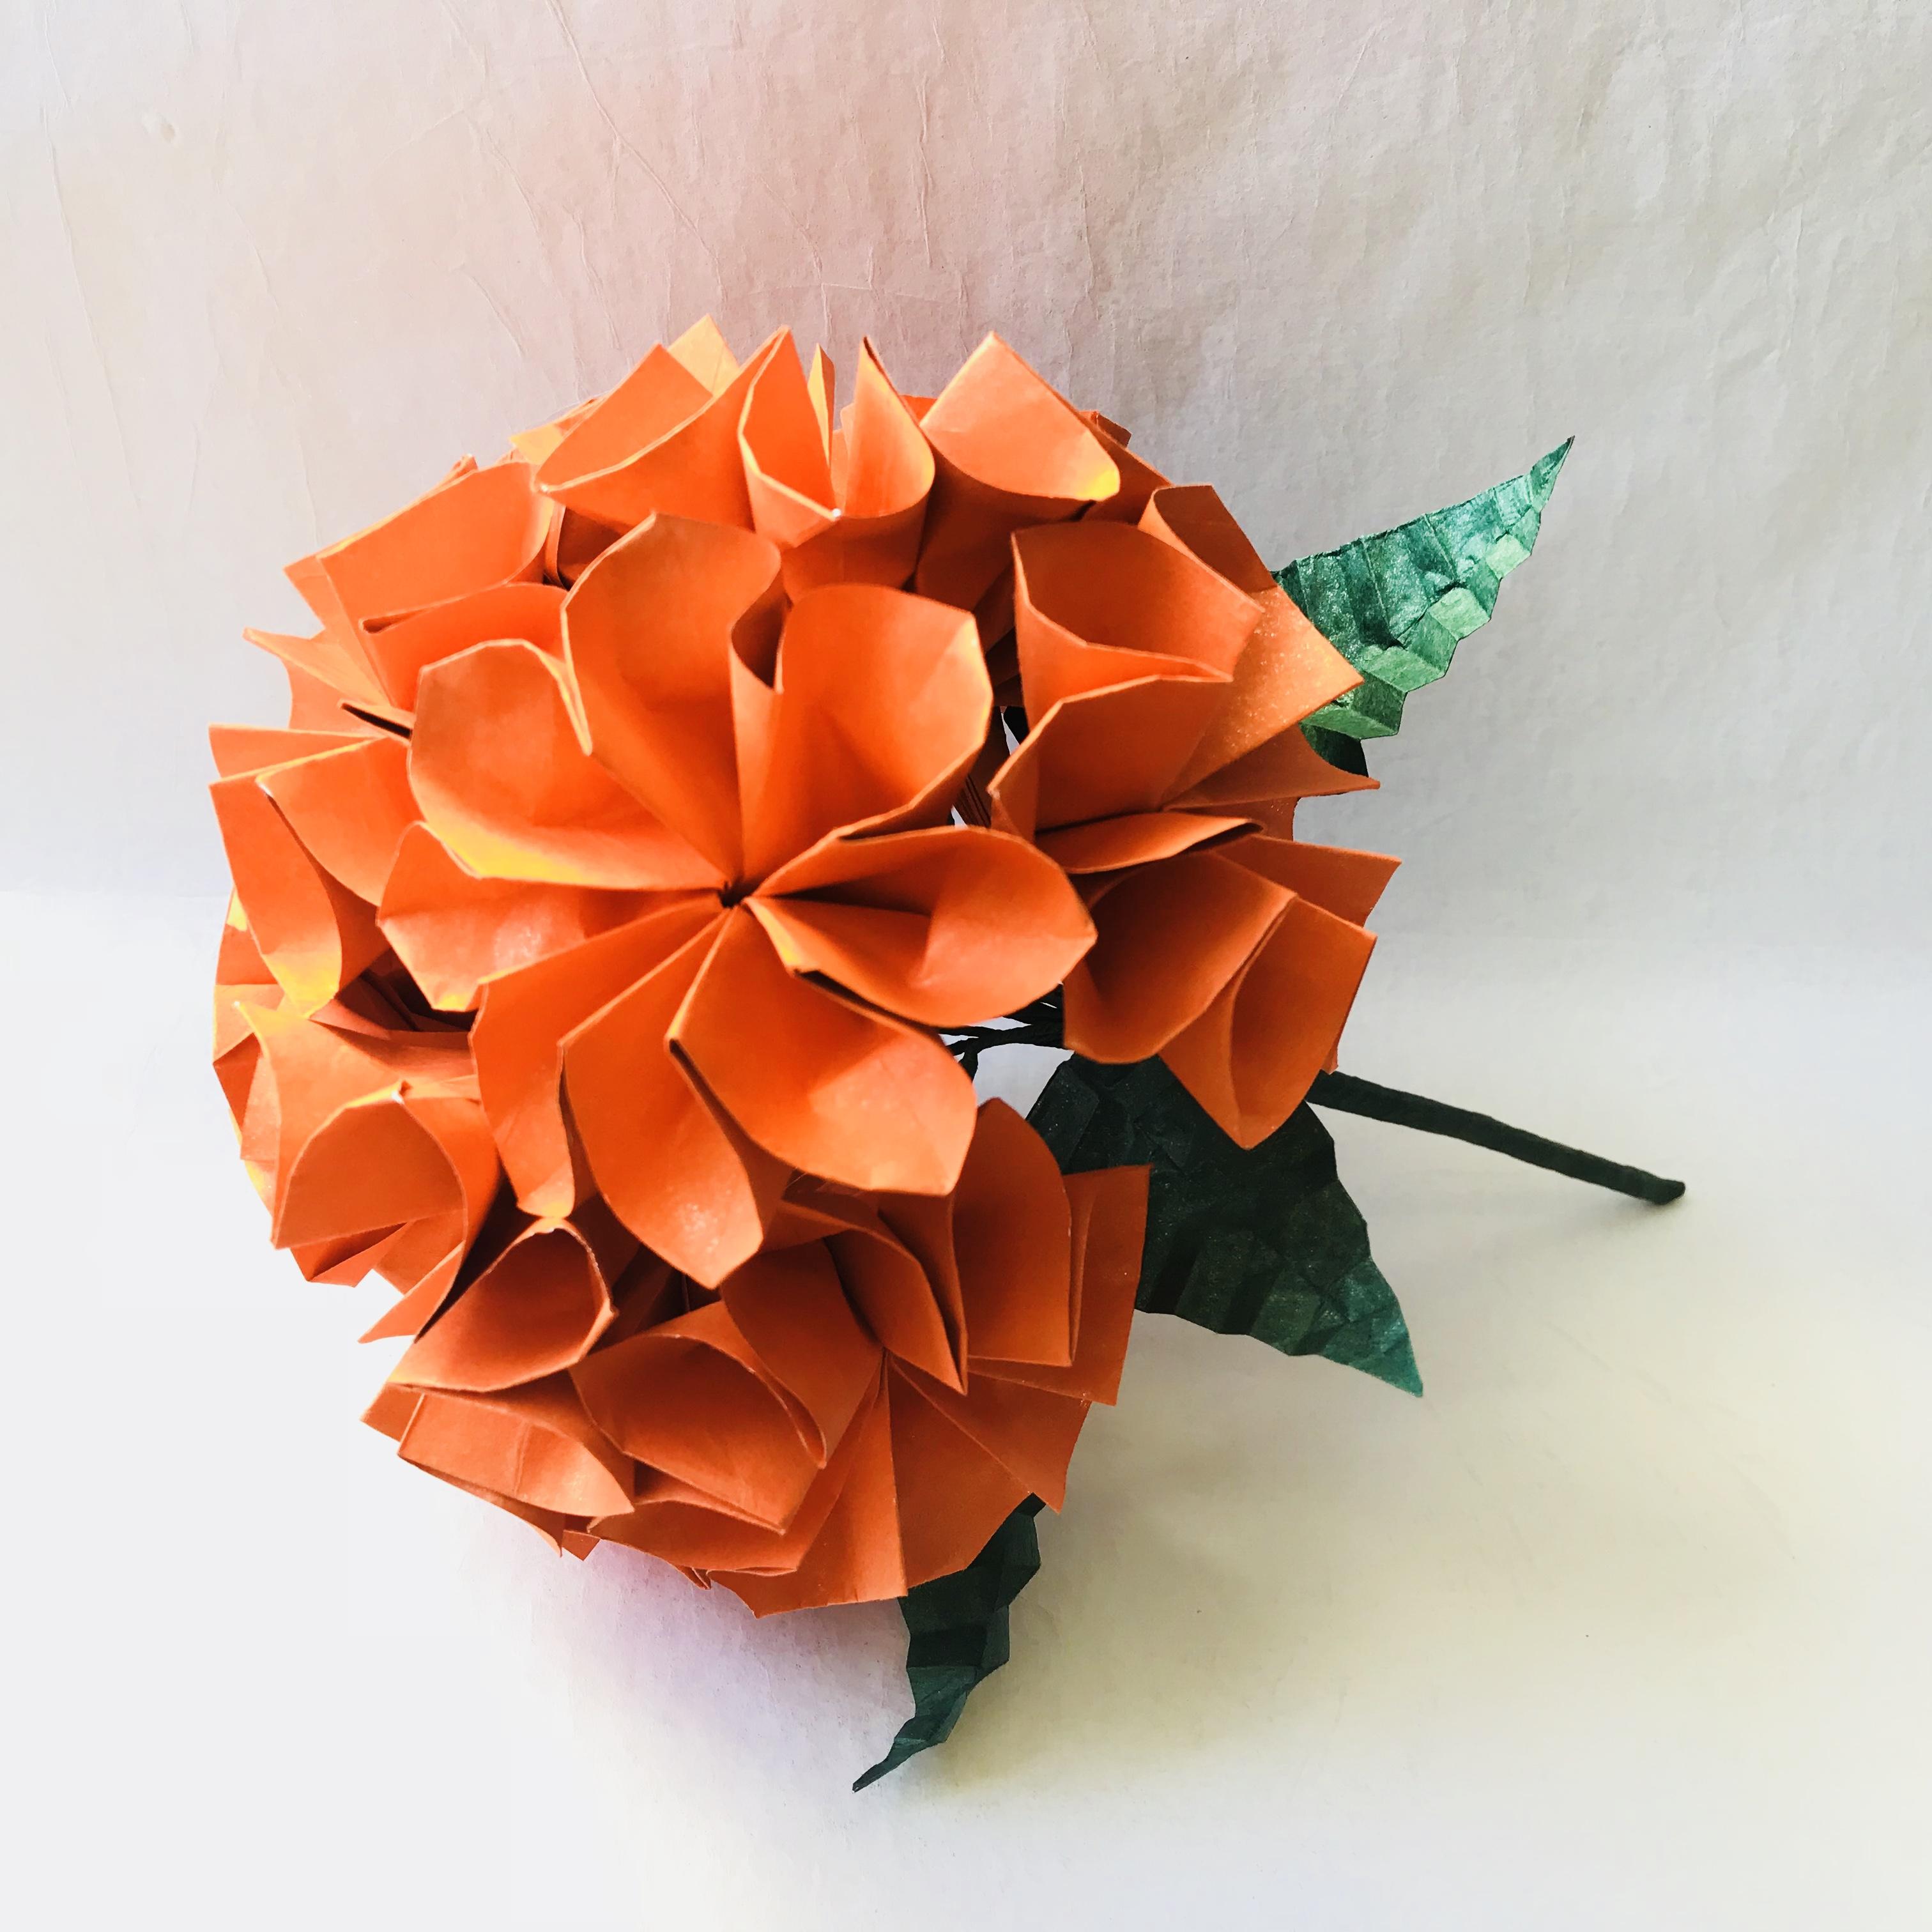 Flower Bouquet Chrysanthemums Taros Origami Studio E Learning